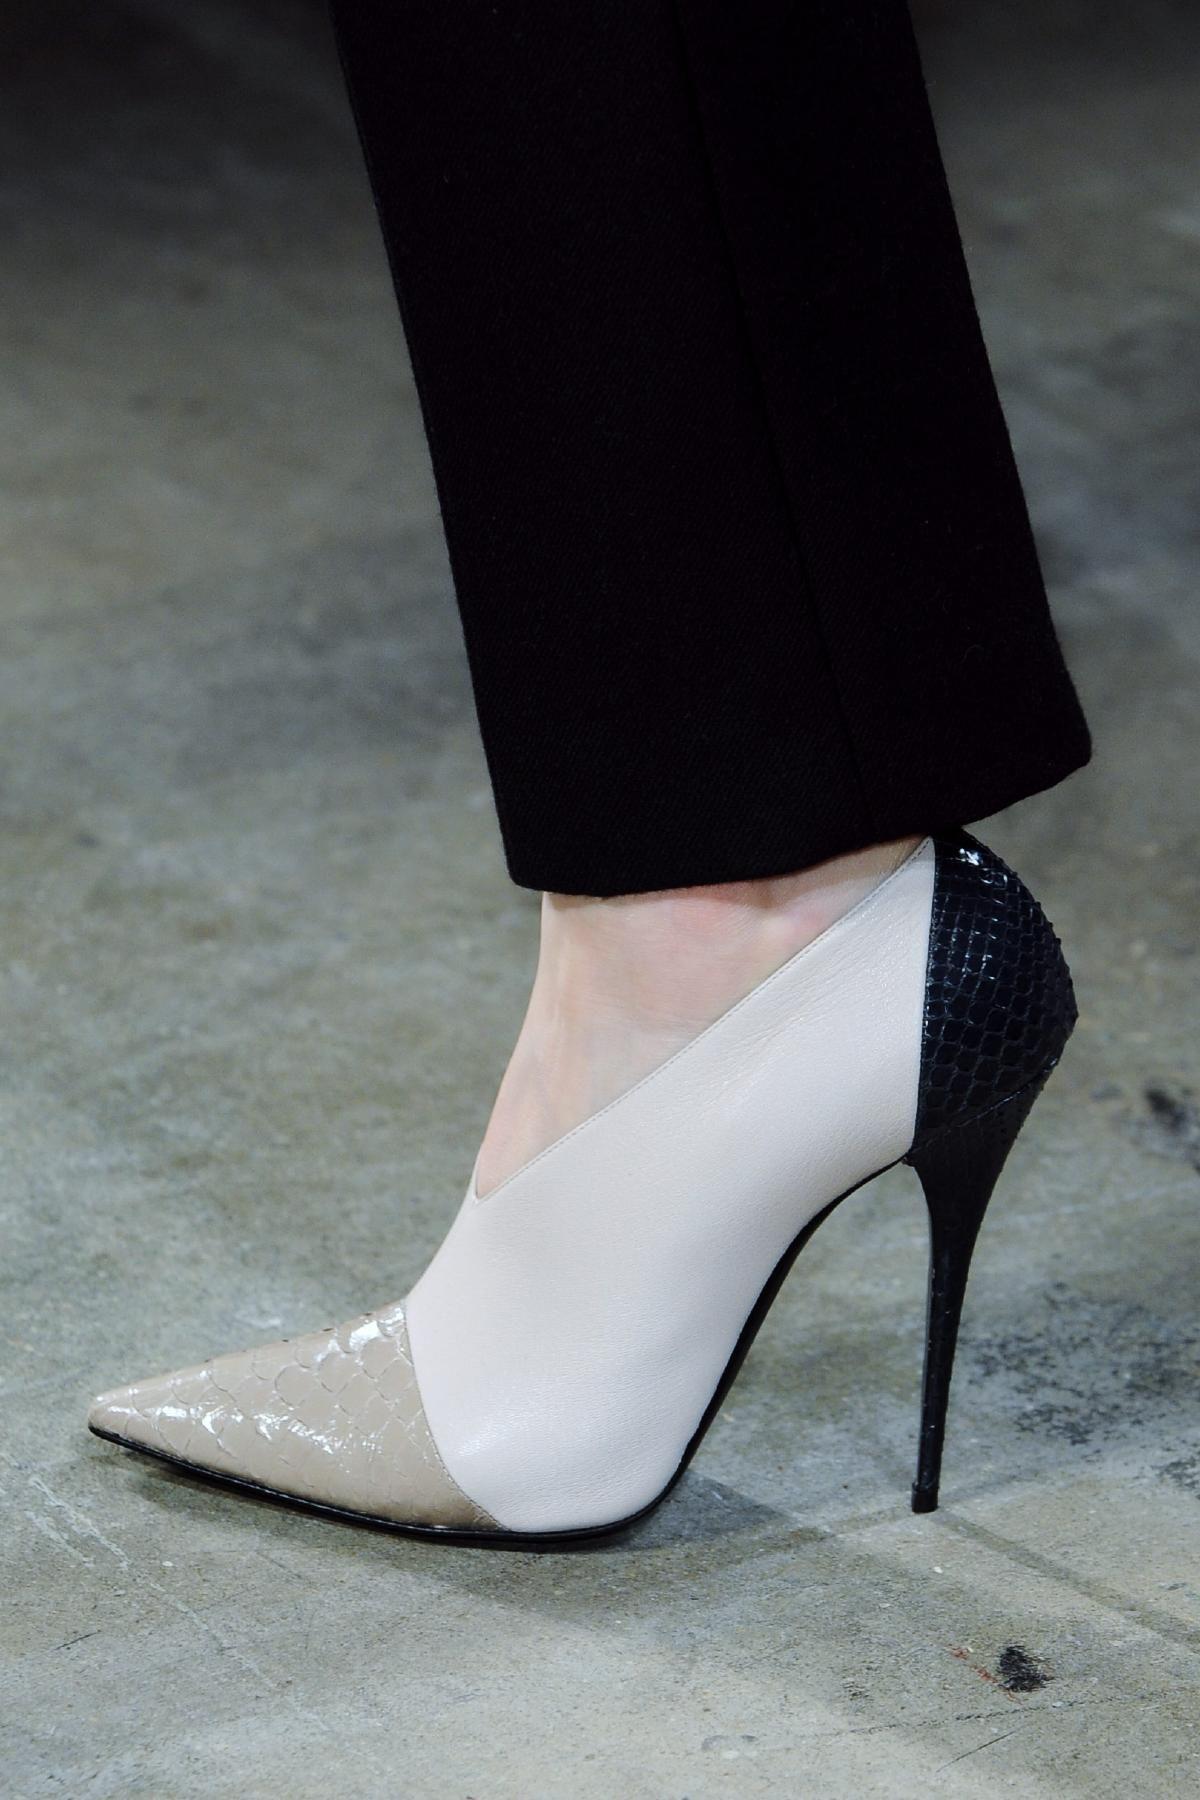 Scarpe Sposa Stuart Weitzman 2013.Narciso Rodriguez Fall 2013 Rtw Fashion Show In 2020 Heels